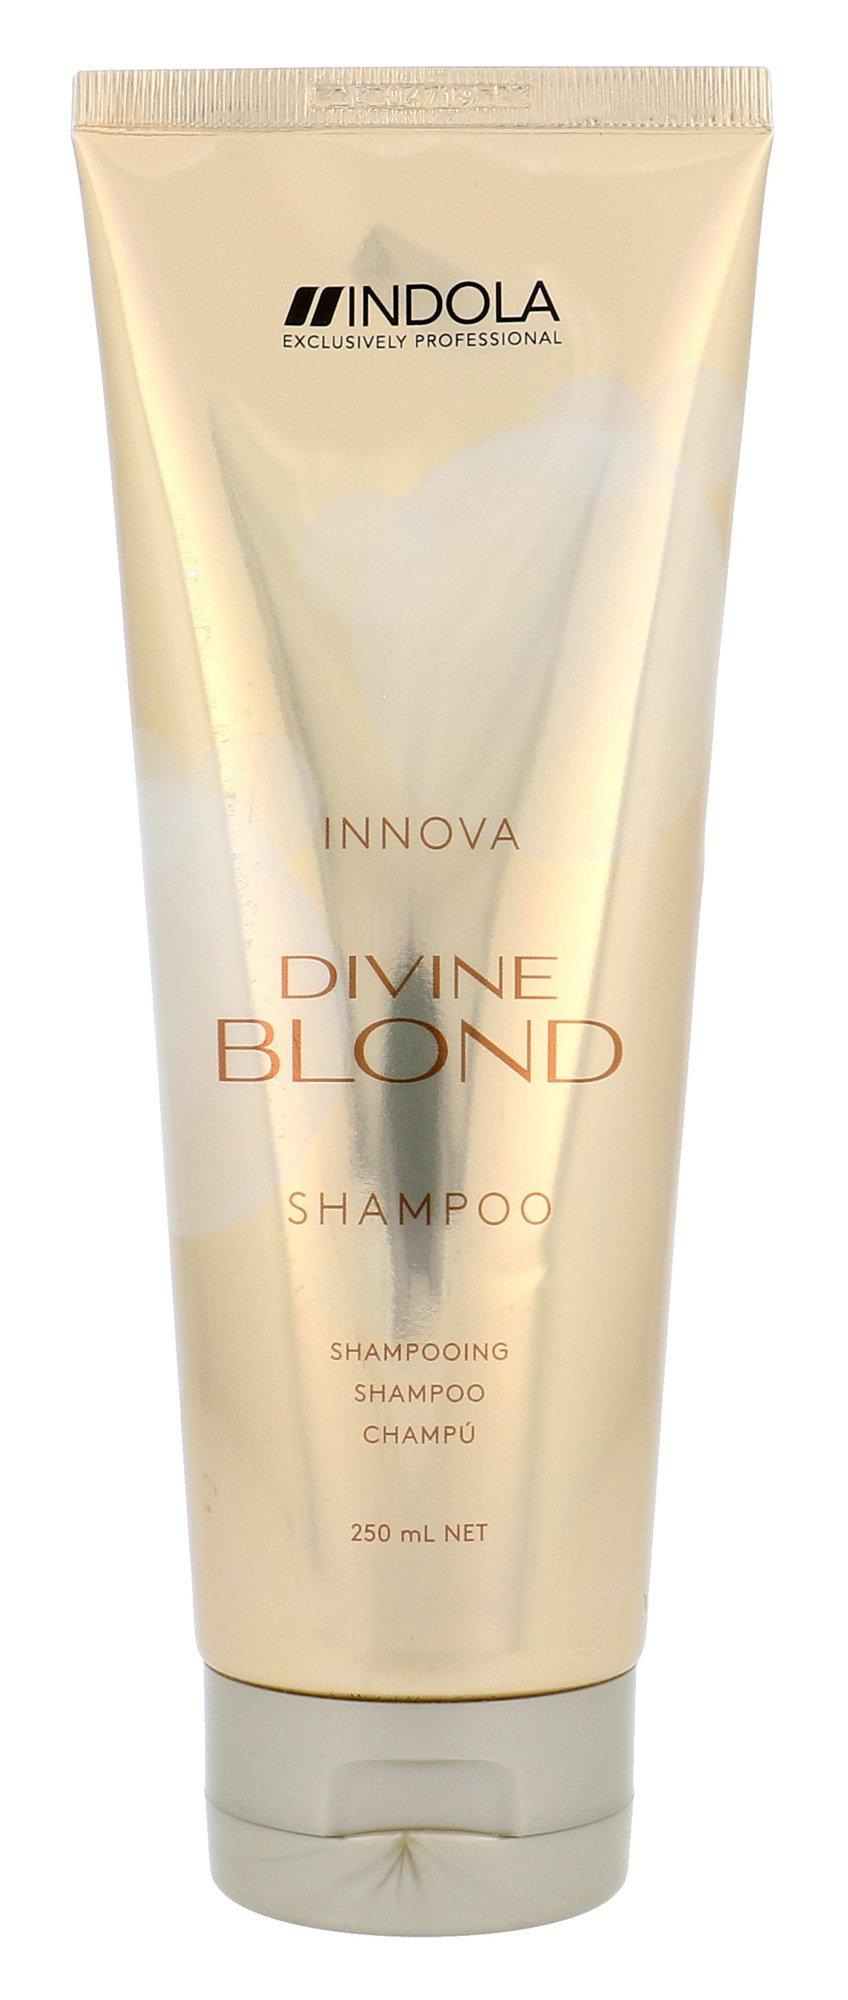 Indola Innova Divine Blond Cosmetic 250ml